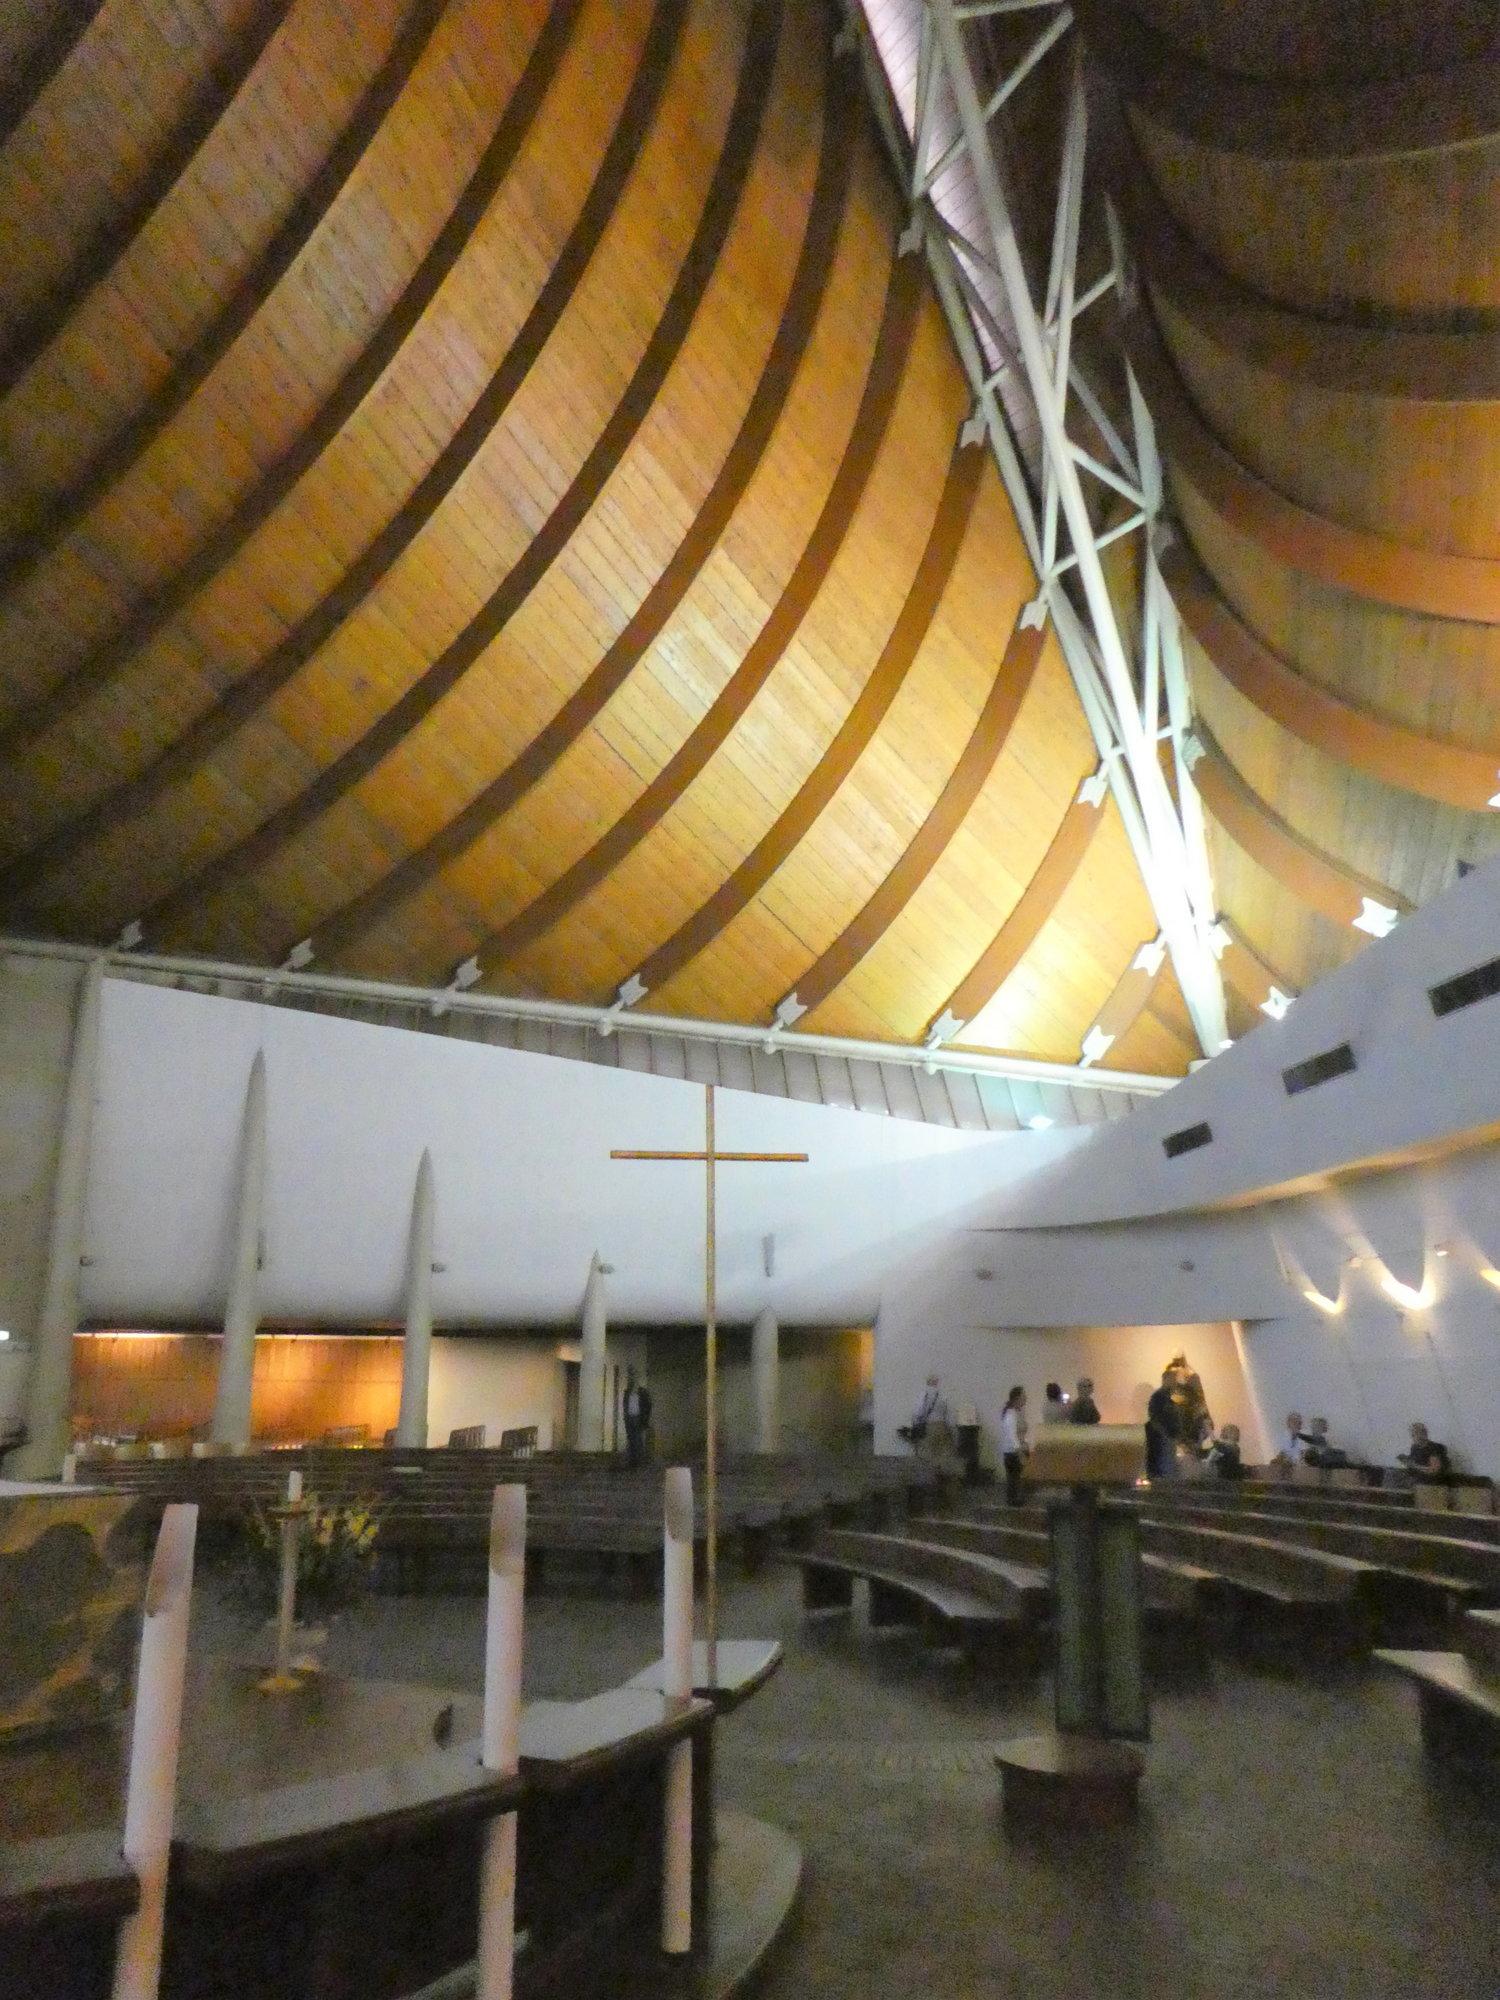 Construction Hangar Bois Prix trip report irresistible france - fodor's travel talk forums